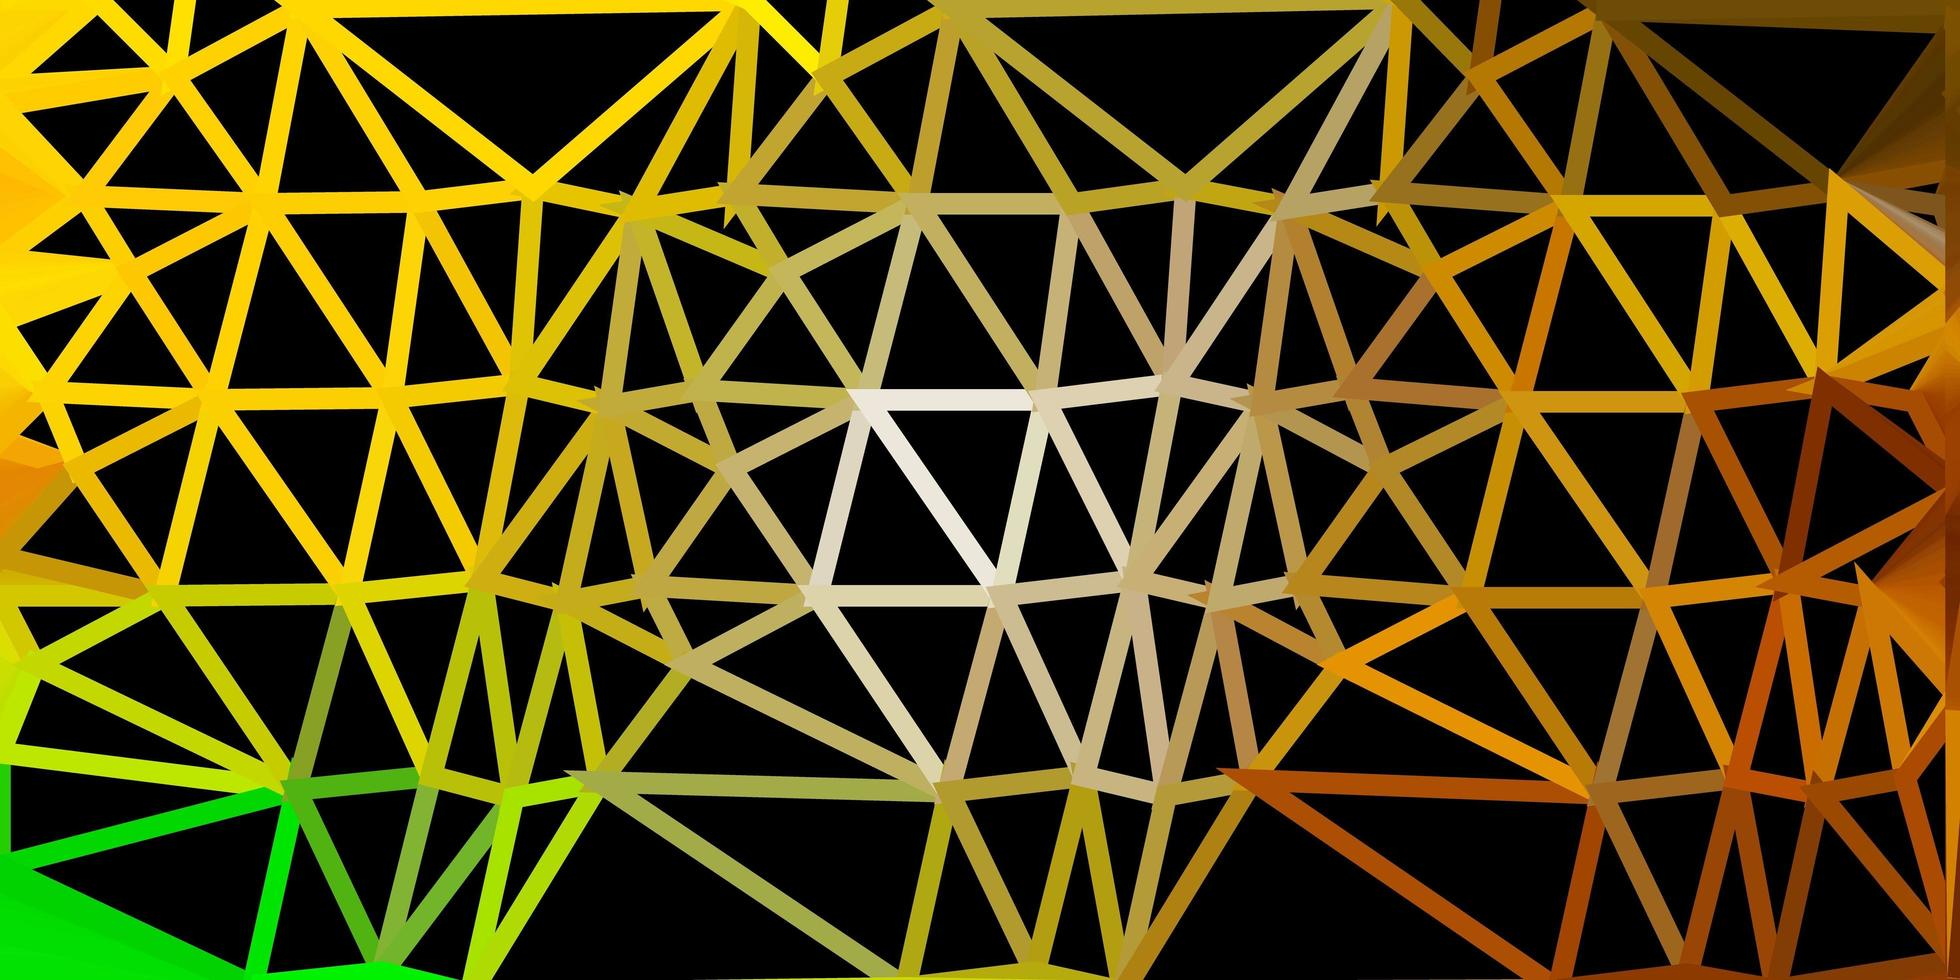 mörkgrön, gul vektor triangel mosaik bakgrund.